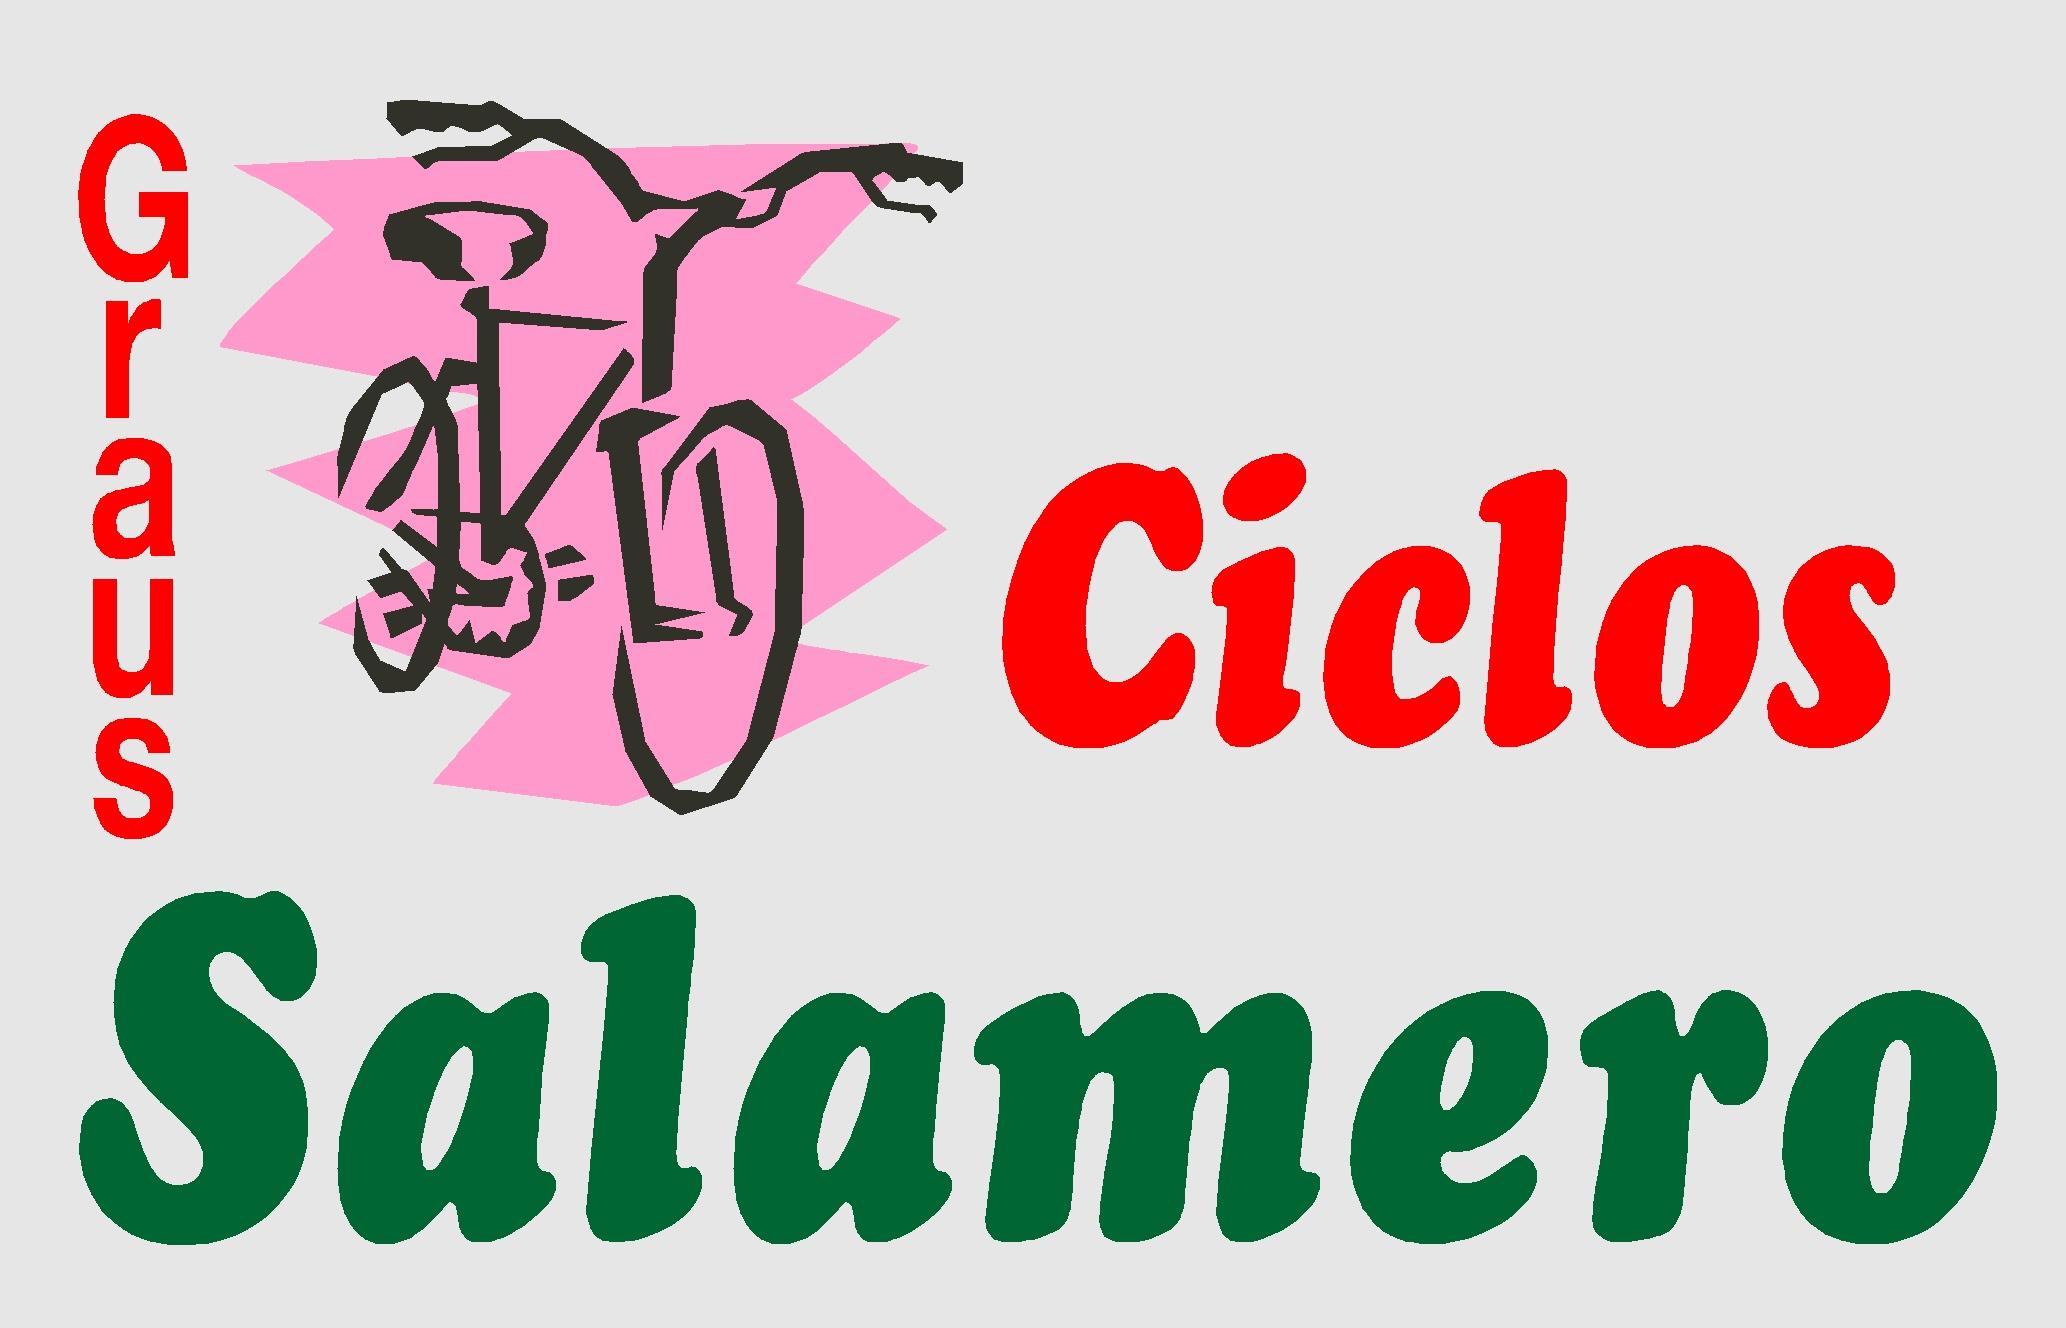 CICLOS SALAMERO